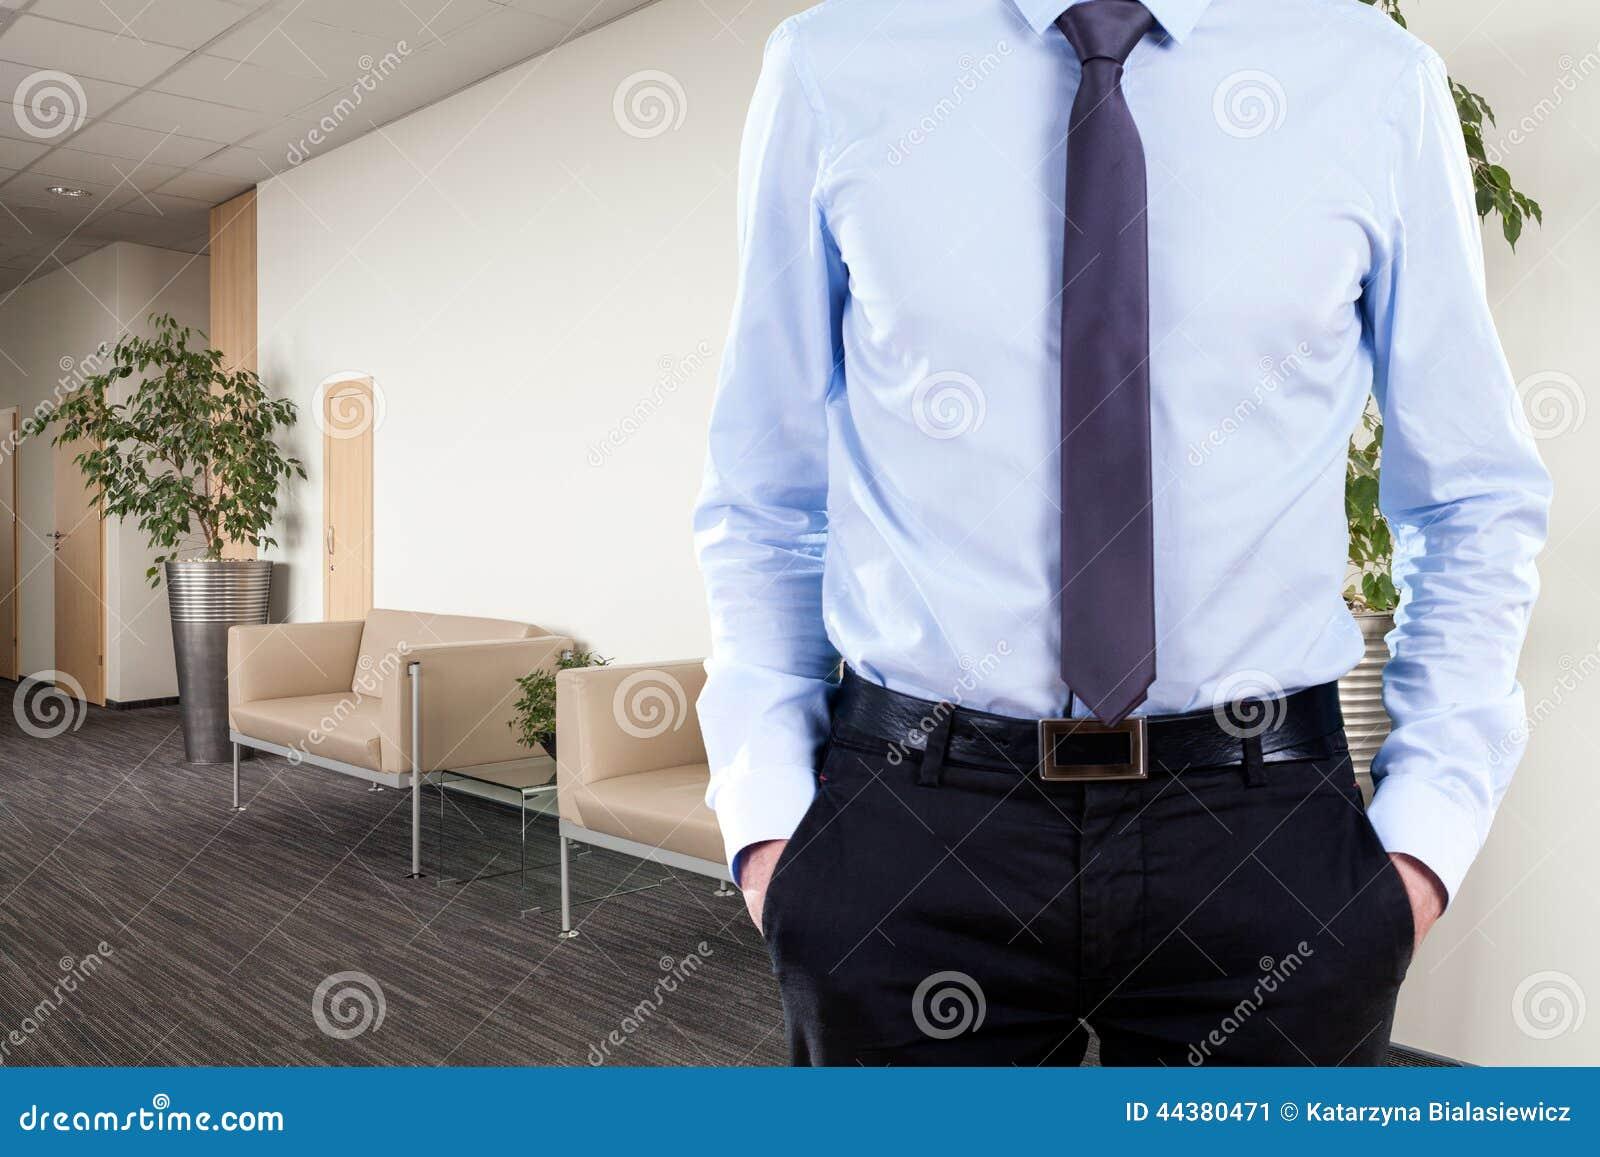 Office Dress Code Stock Photo - Image: 44380471